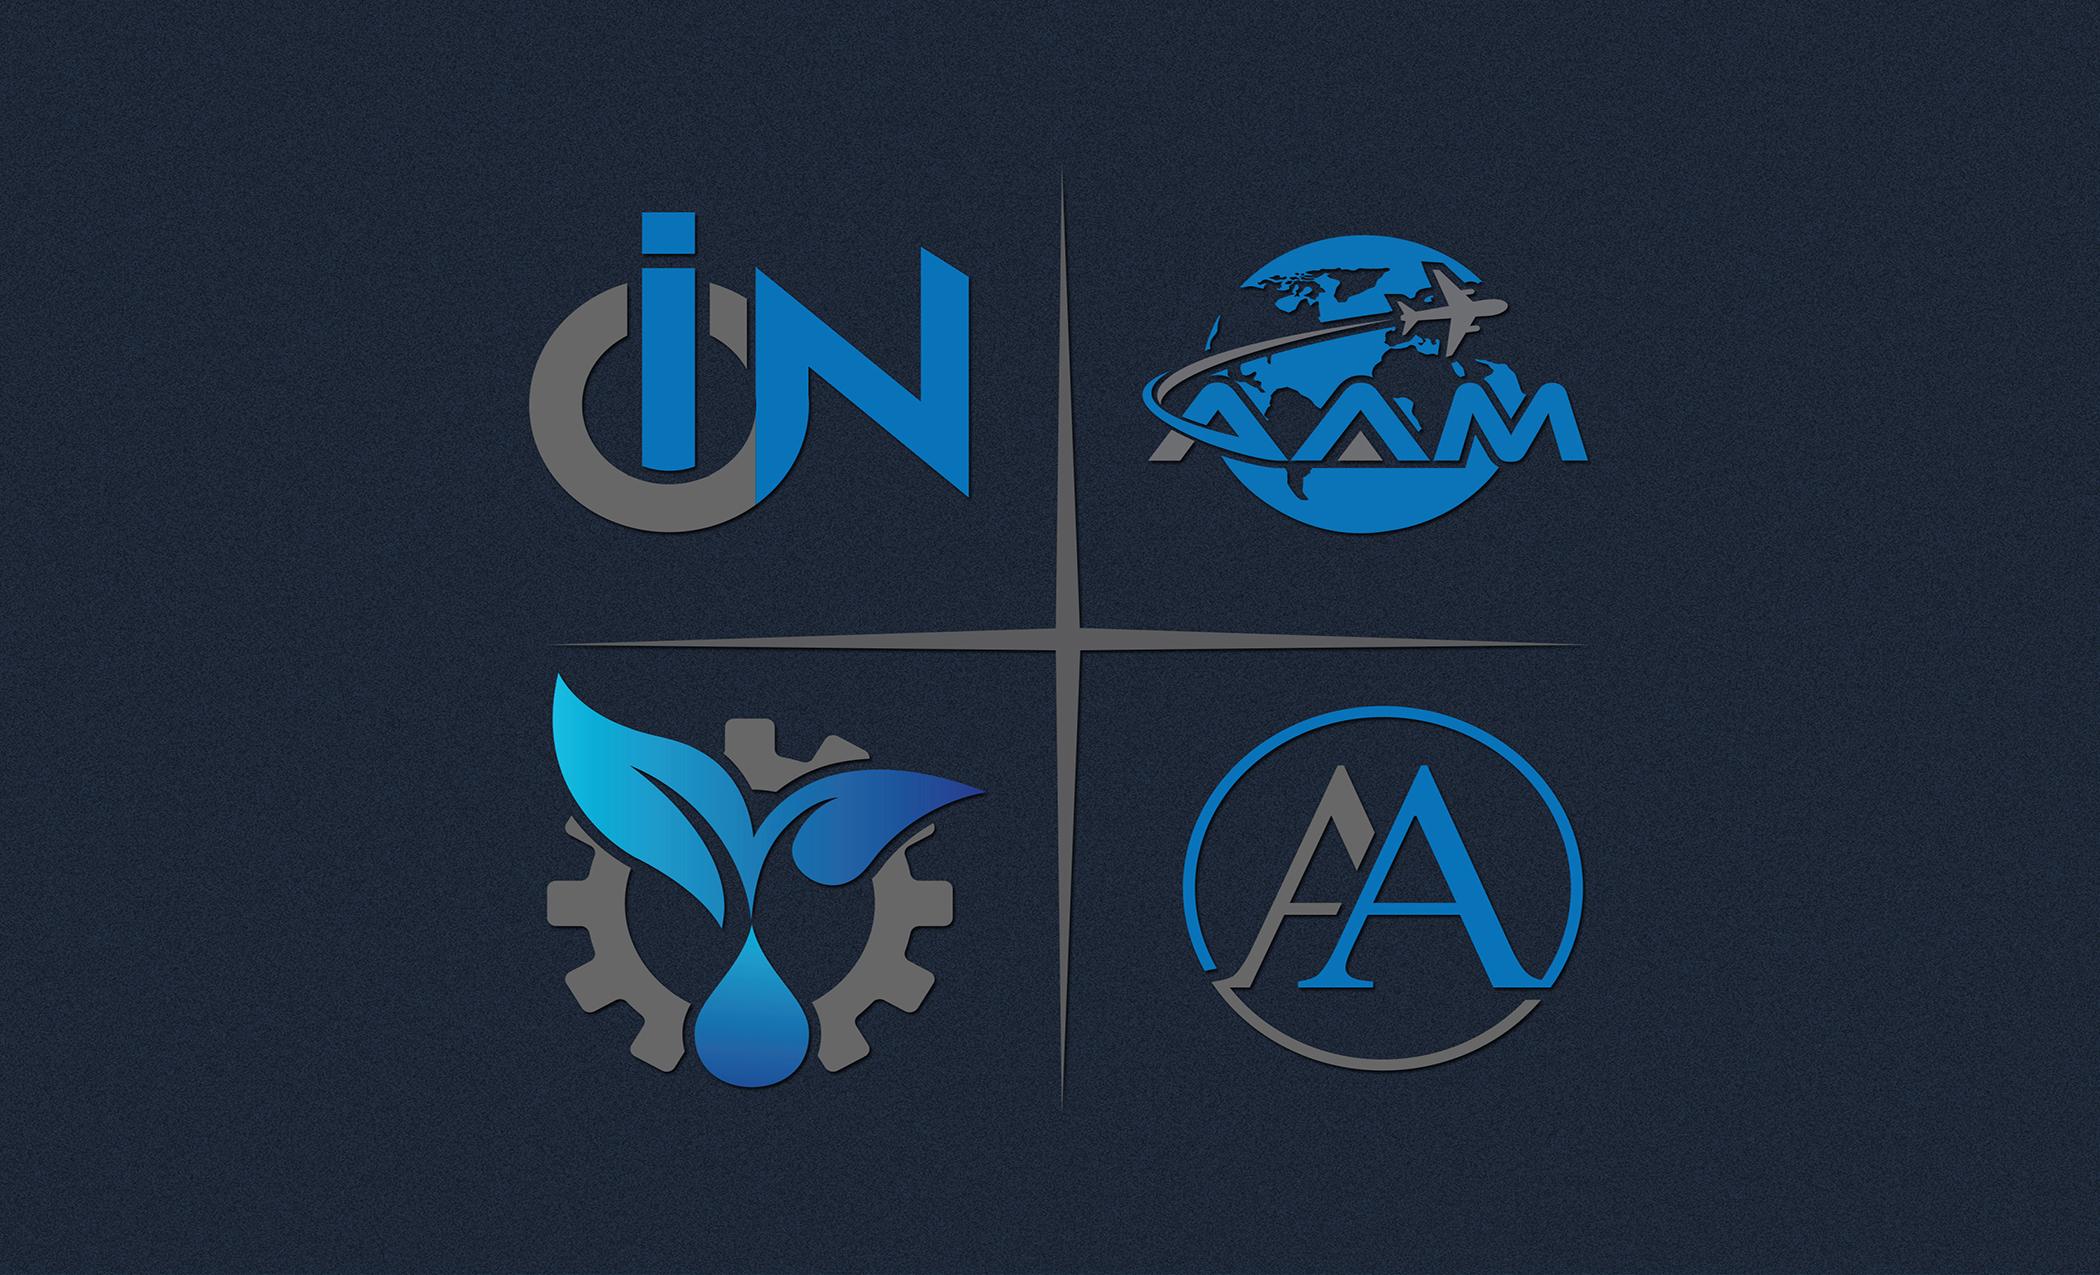 I will design an outstanding modern minimalist logo